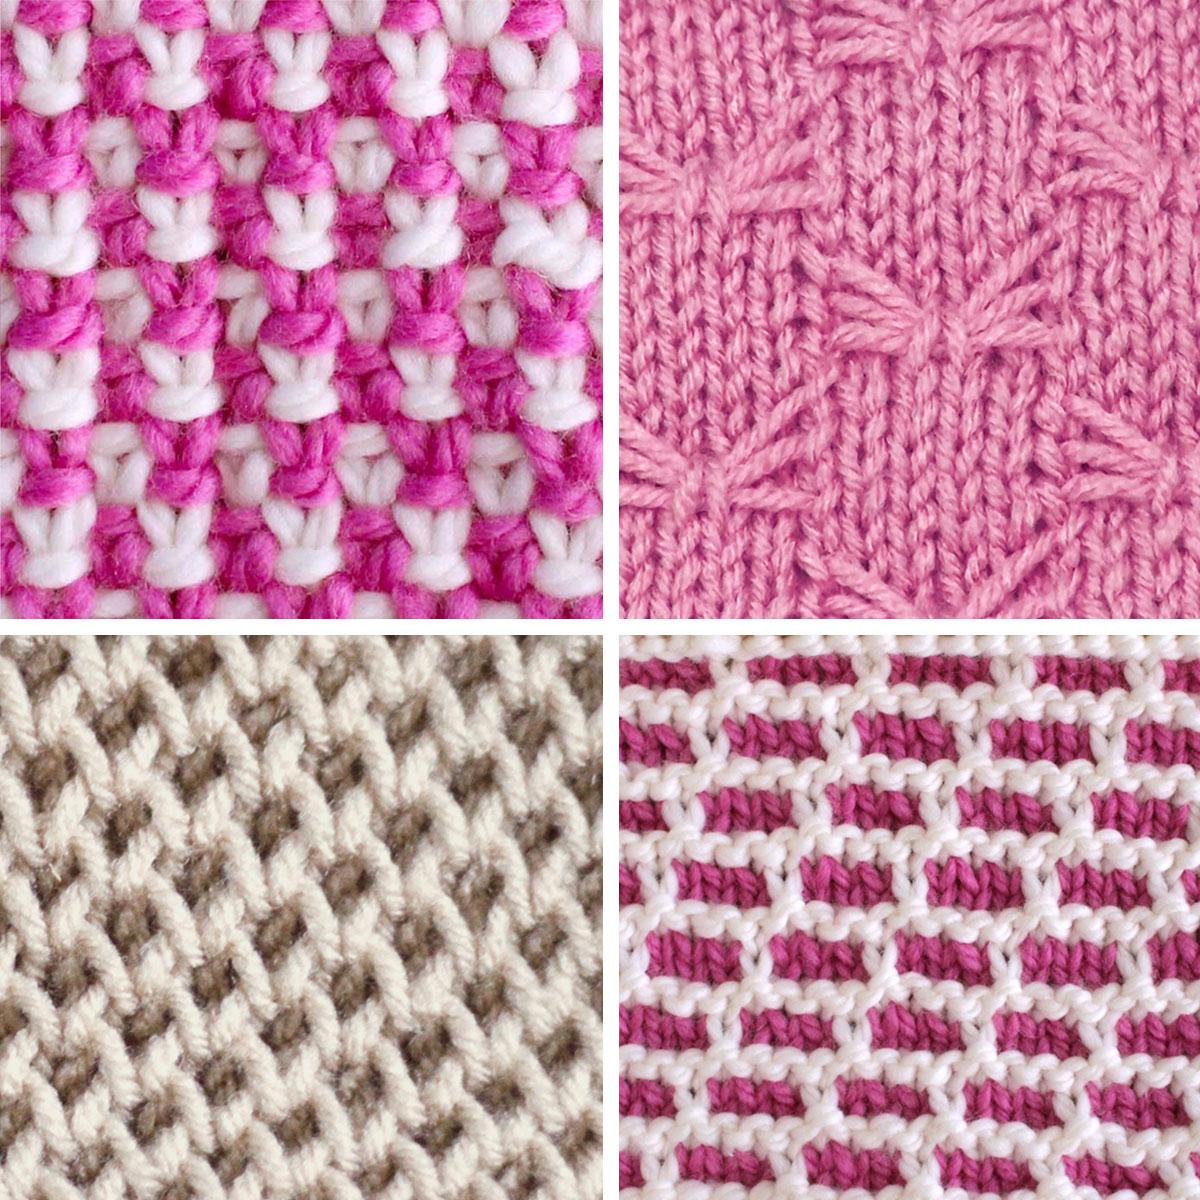 Slip Stitch Knitting Patterns of Linen, Butterfly, Honeycomb, and Brick Stitches